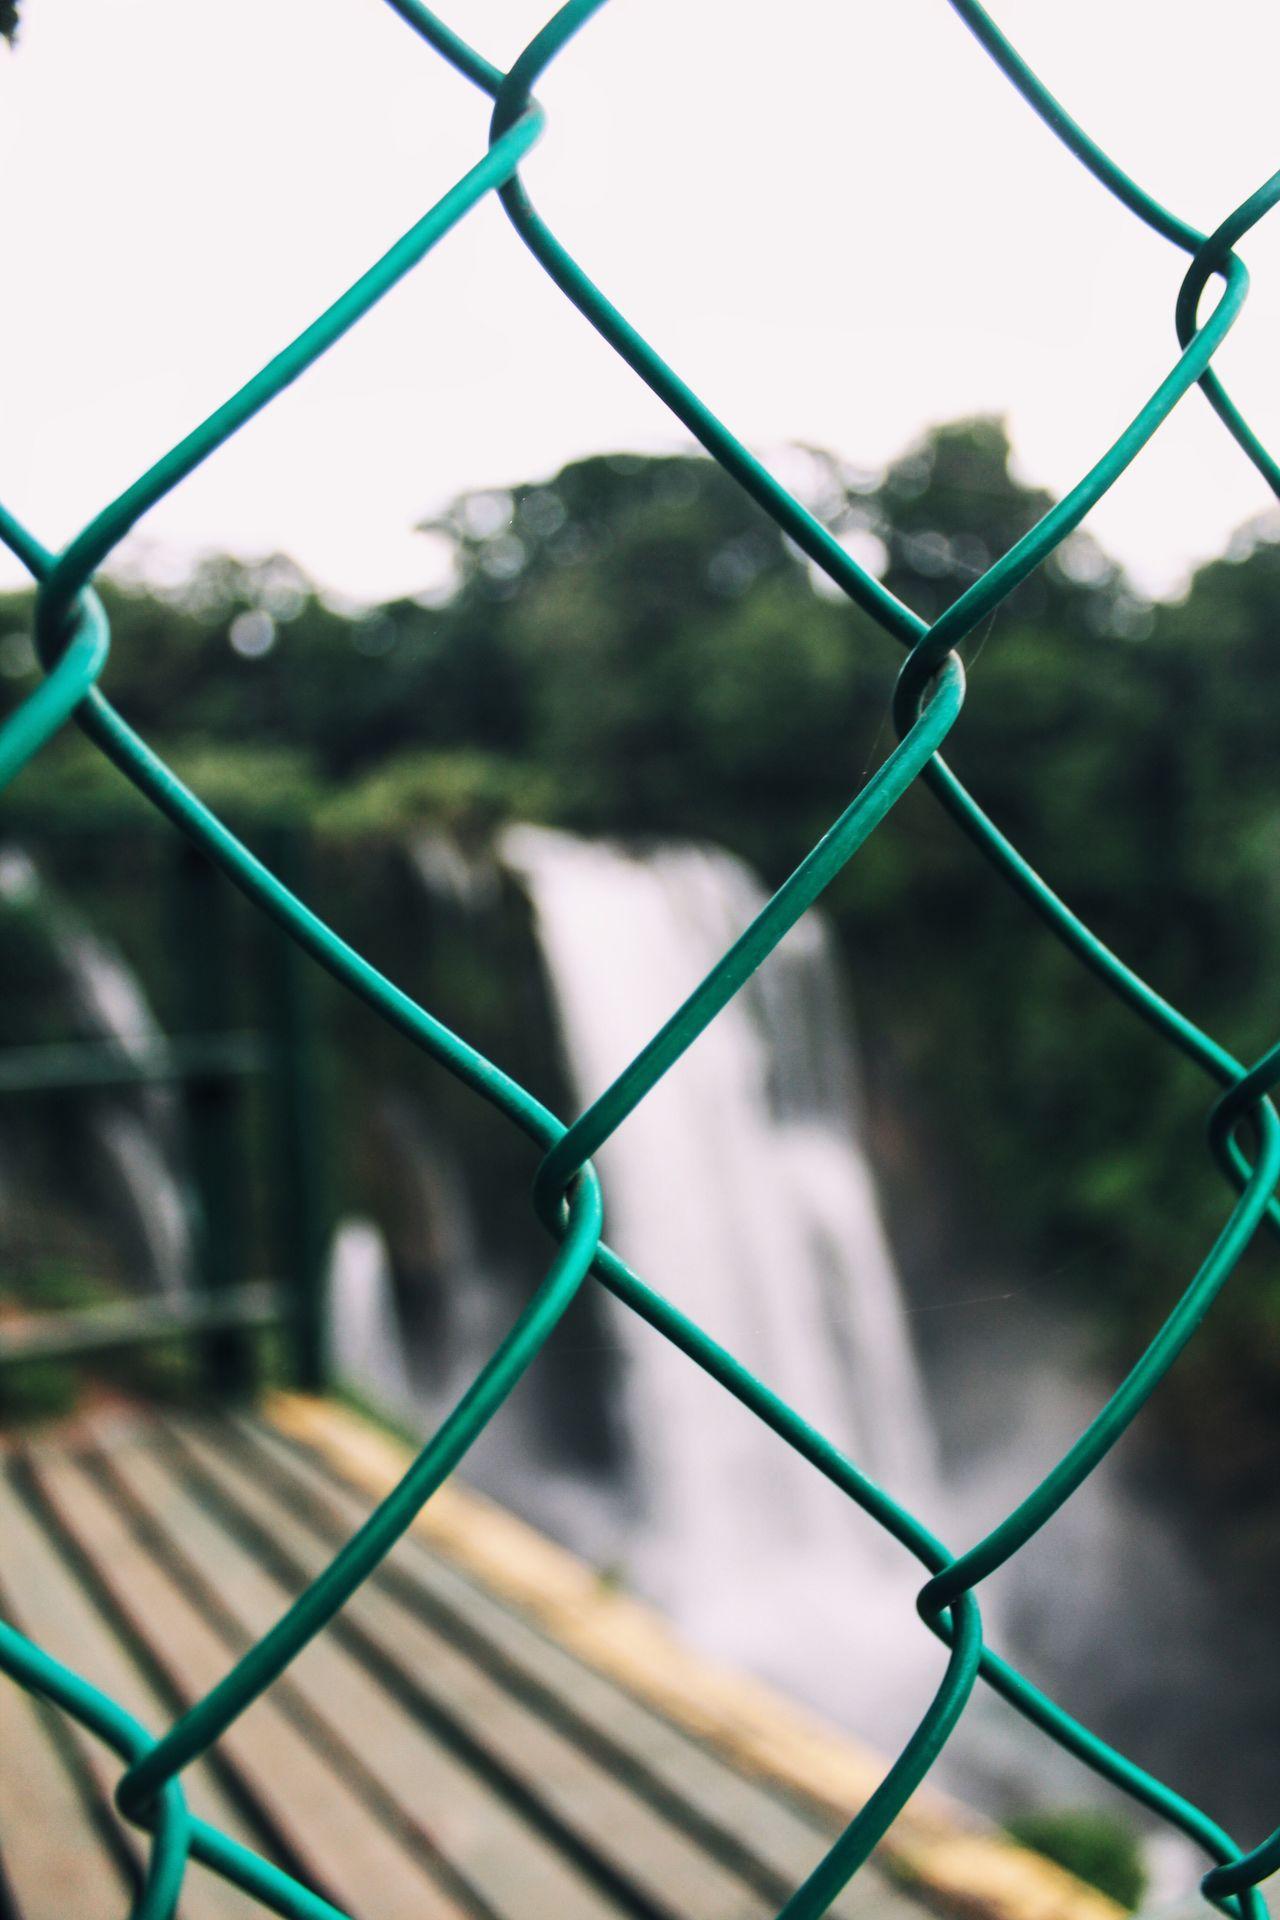 Fresh 🌊 EyeEm Best Shots EyeEm Nature Lover Focus On Foreground No People Nature Mood Exposure Honduras Green Waterfall